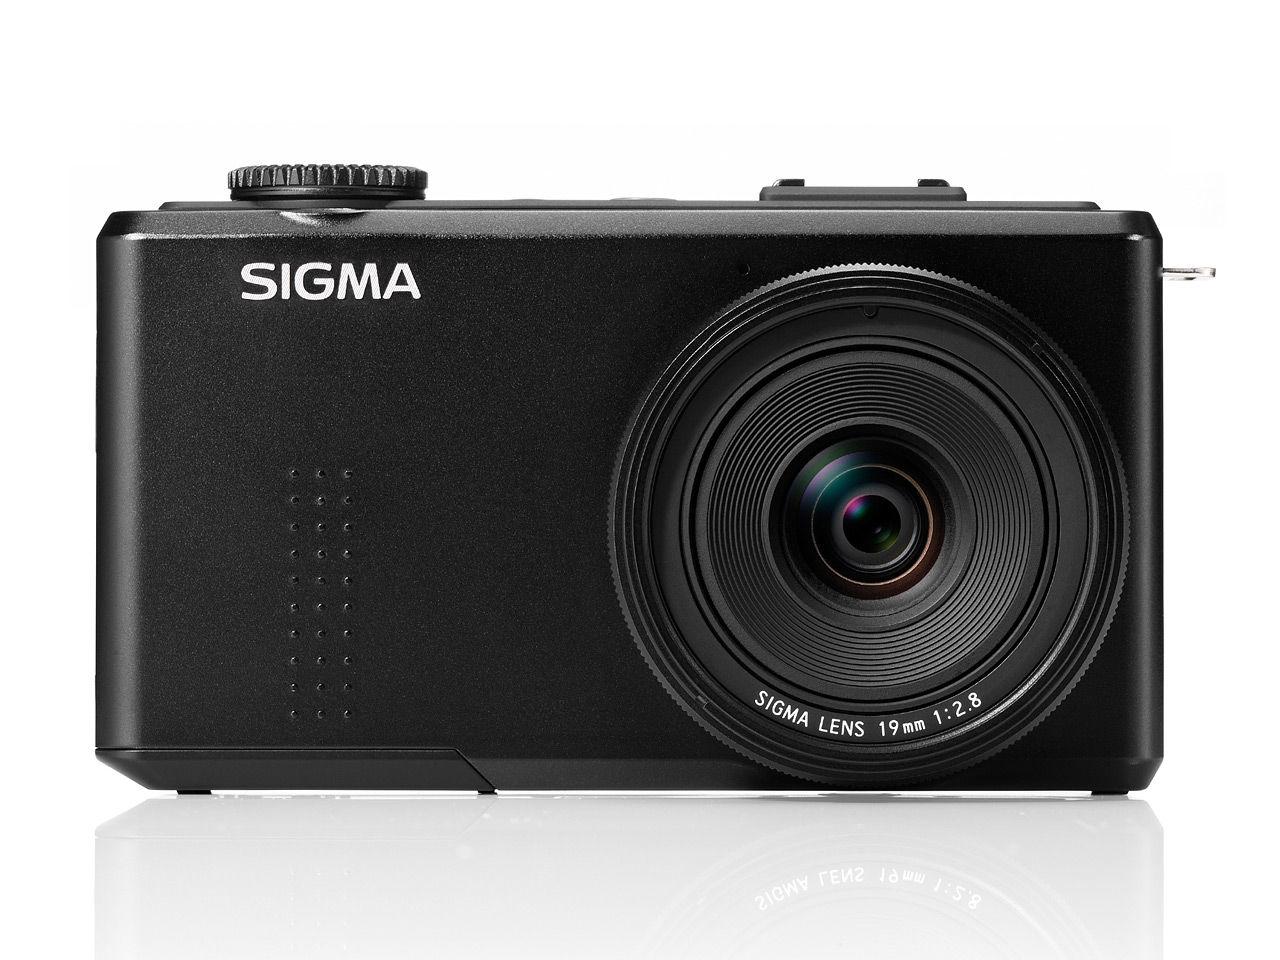 Sigma uppdaterar sina kameror